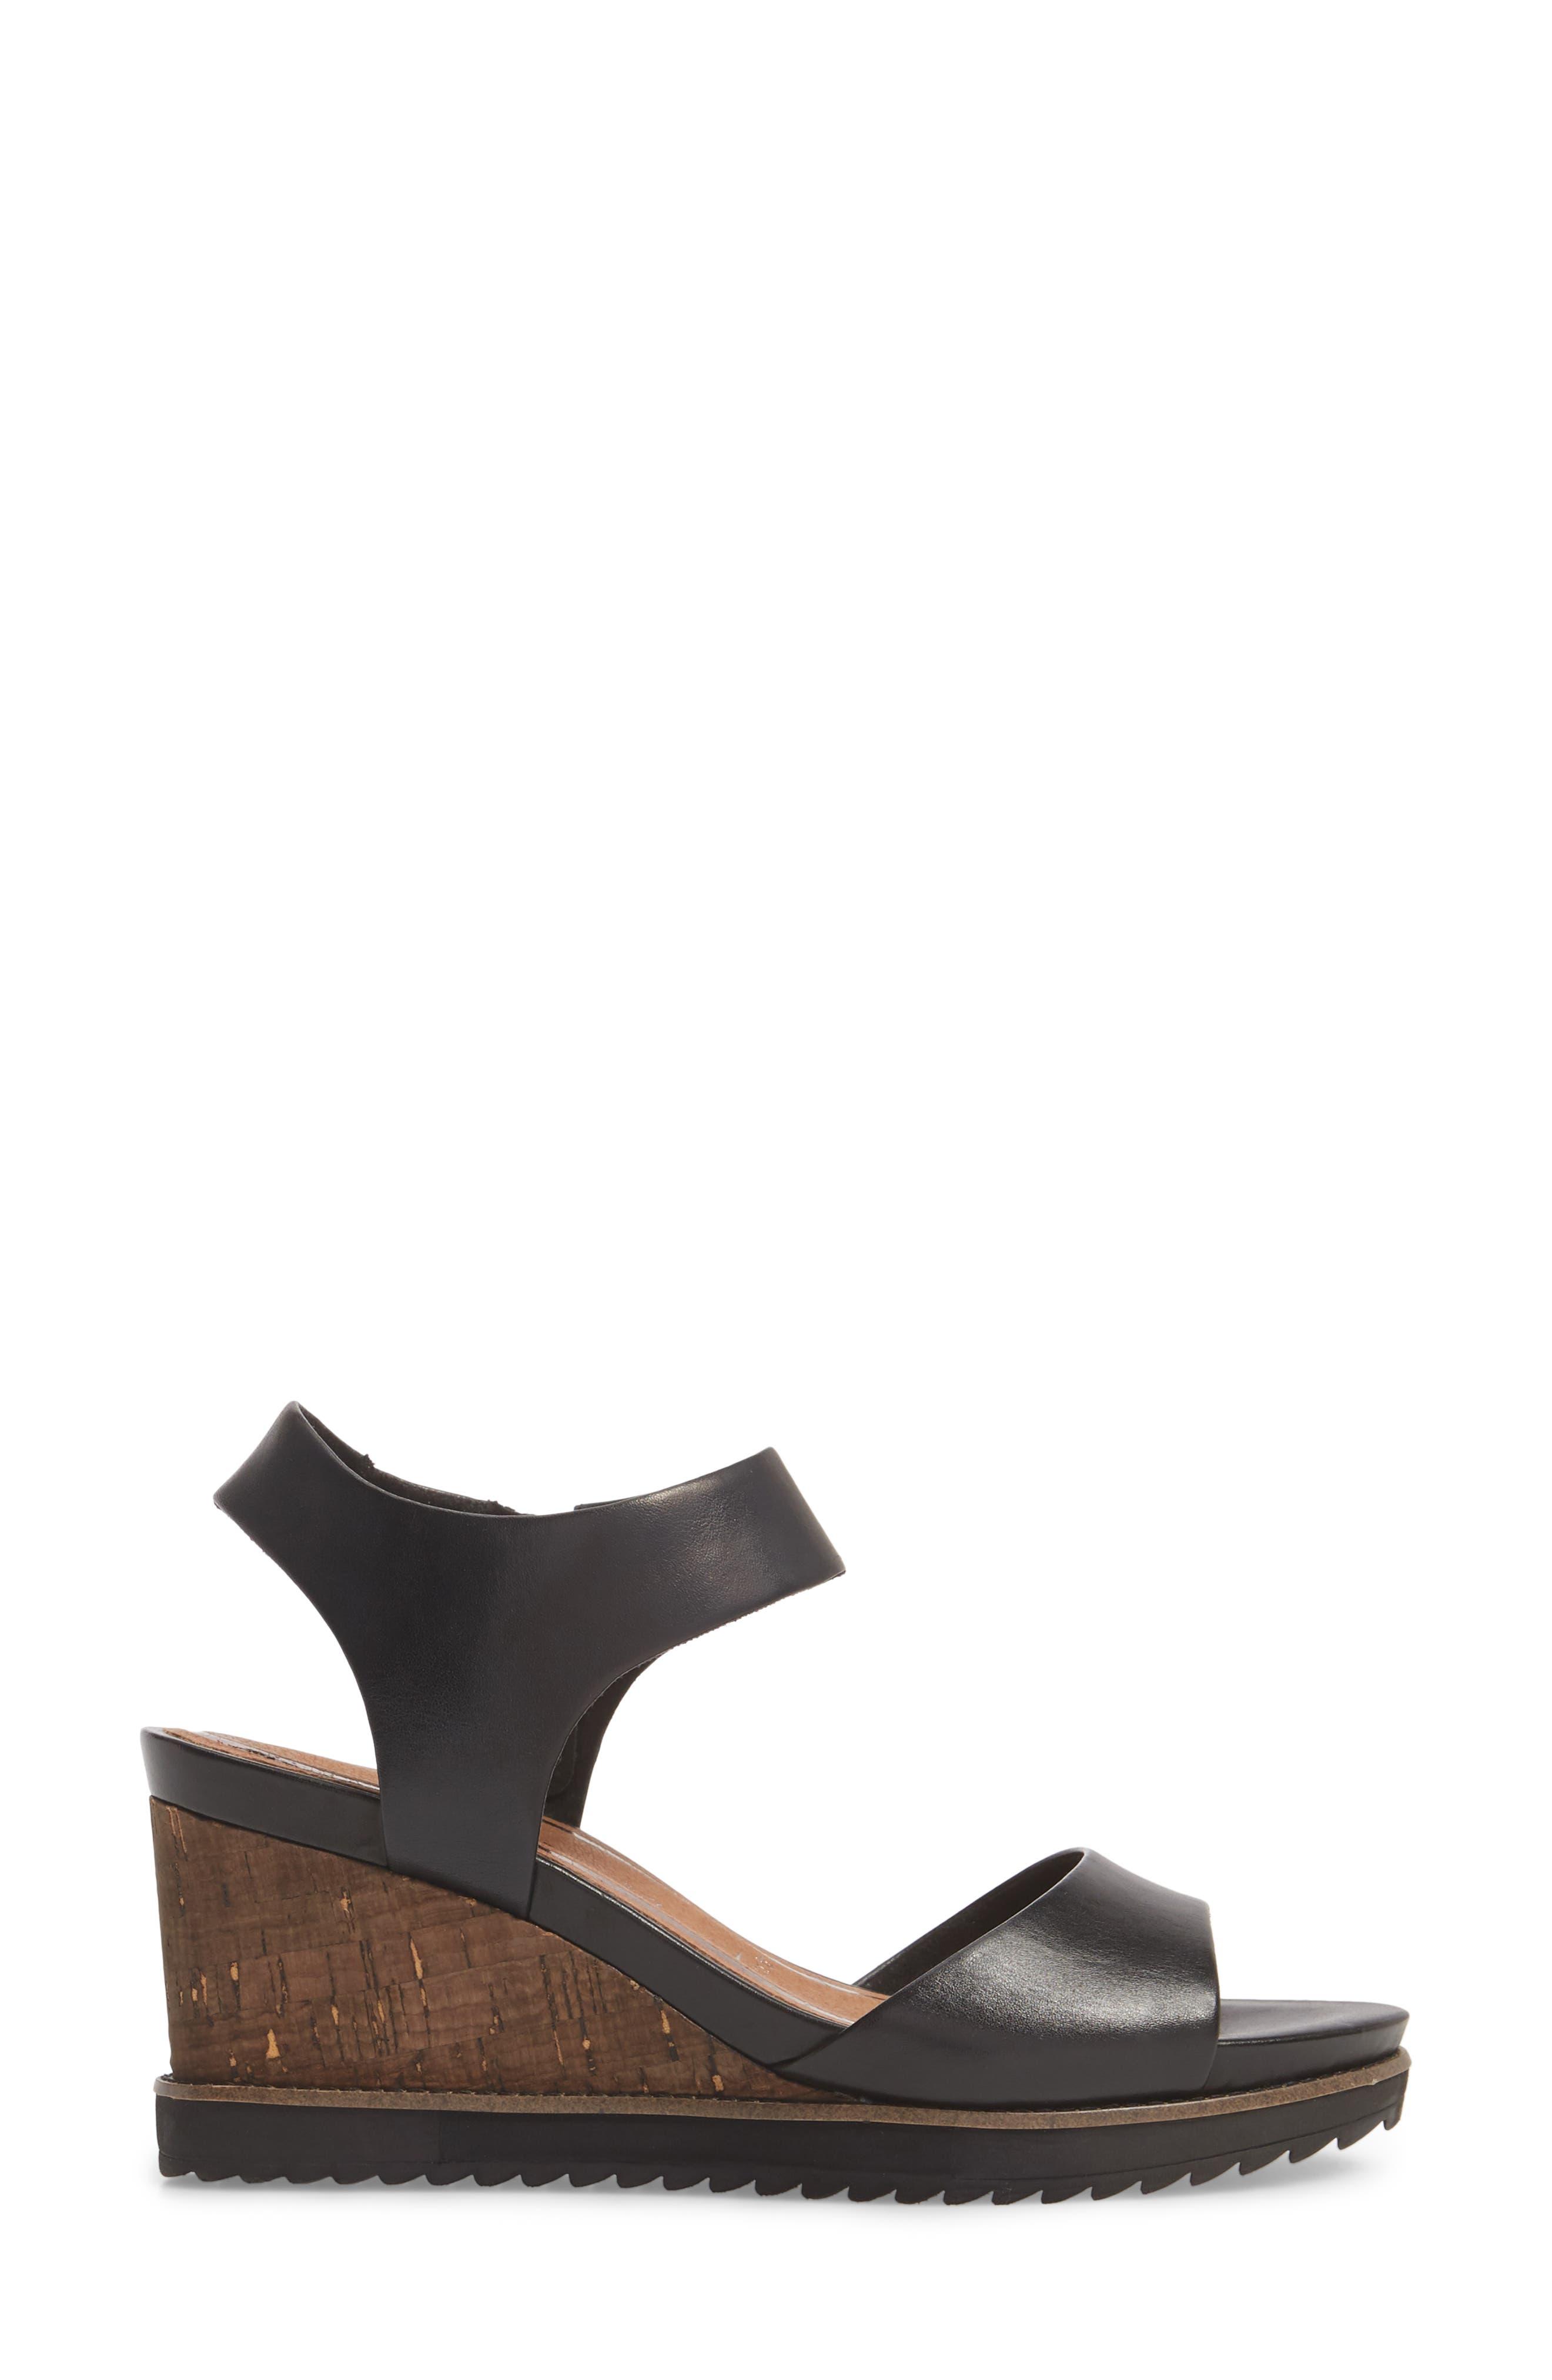 'Alis' Lug Sole Wedge Sandal,                             Alternate thumbnail 3, color,                             003